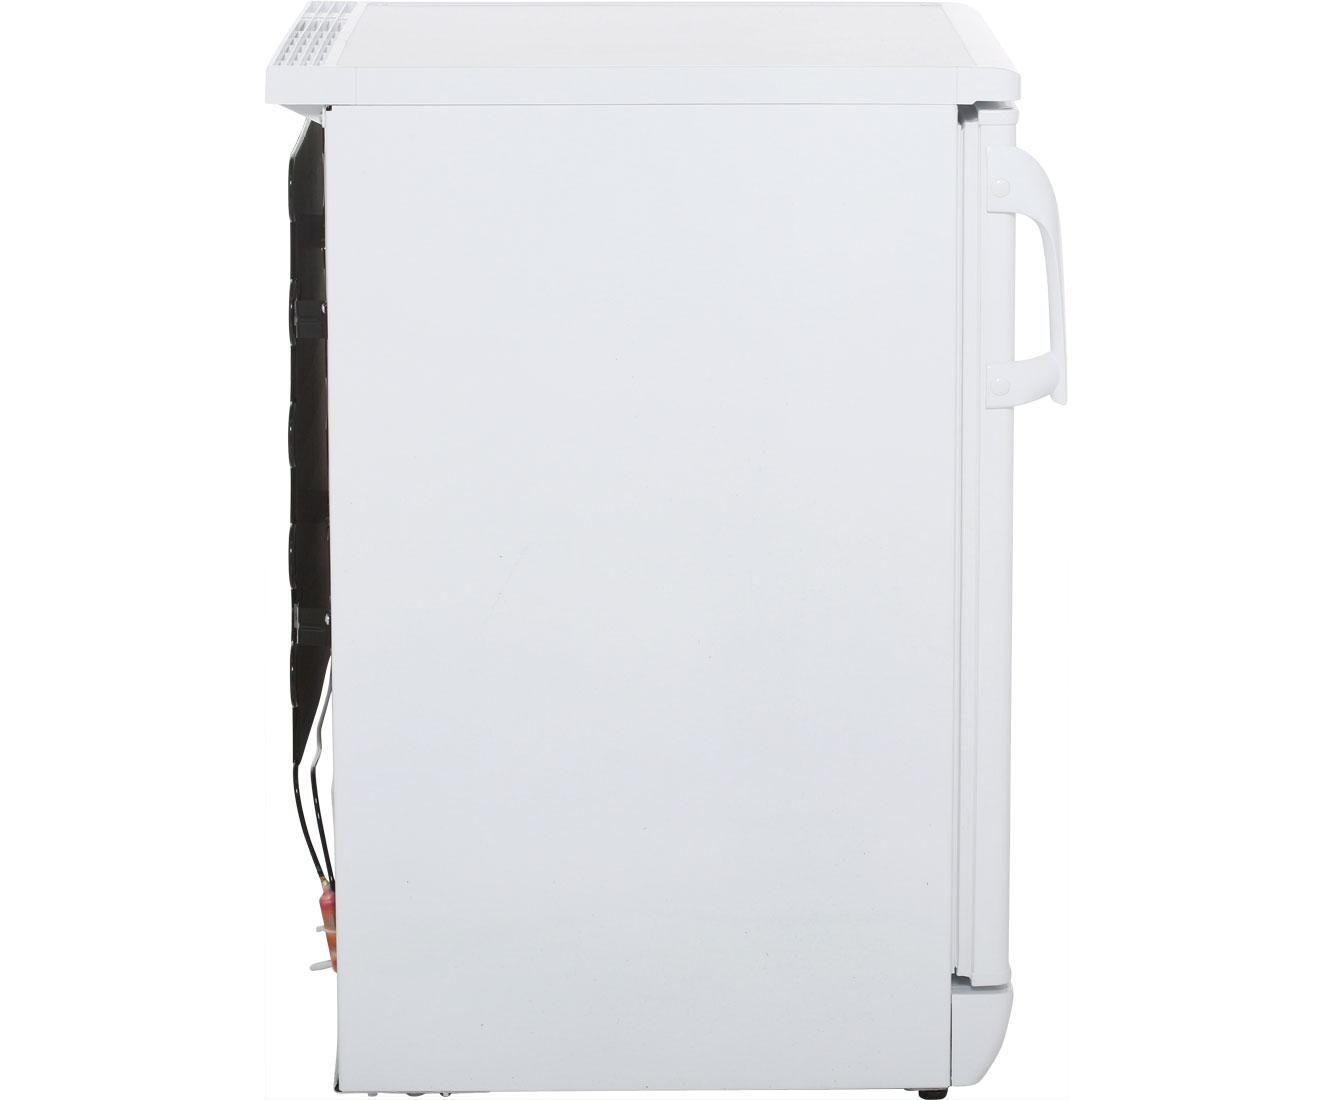 Gorenje Kühlschrank Service : Gorenje r6093aw kühlschrank weiß a